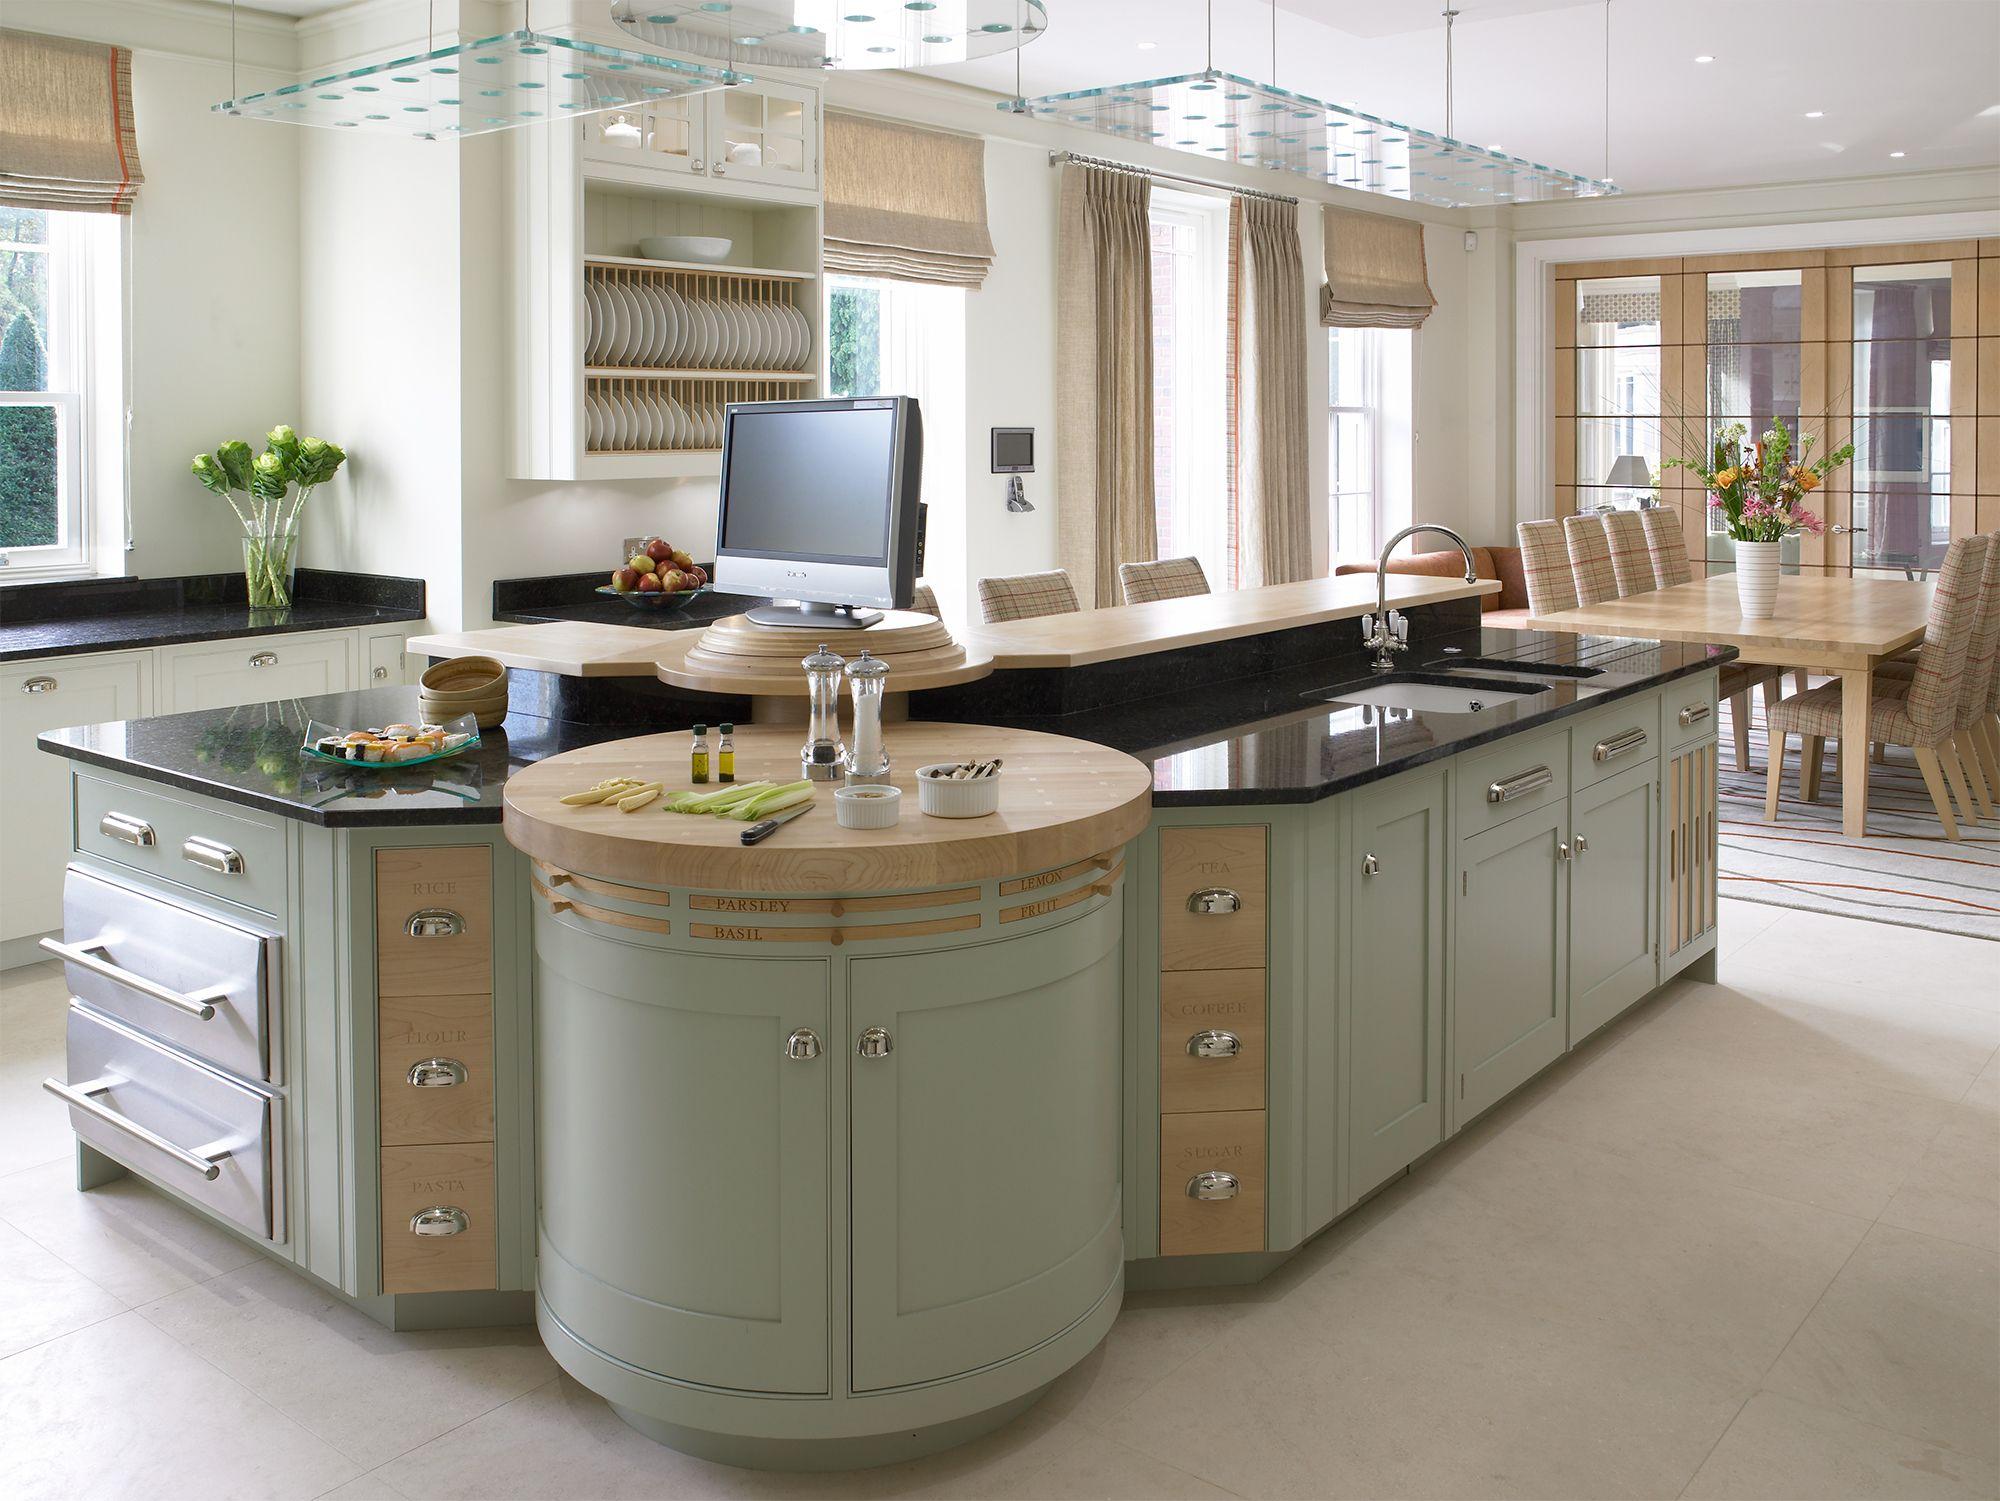 Luxury Bespoke Kitchens - New England Collection | Mark ...